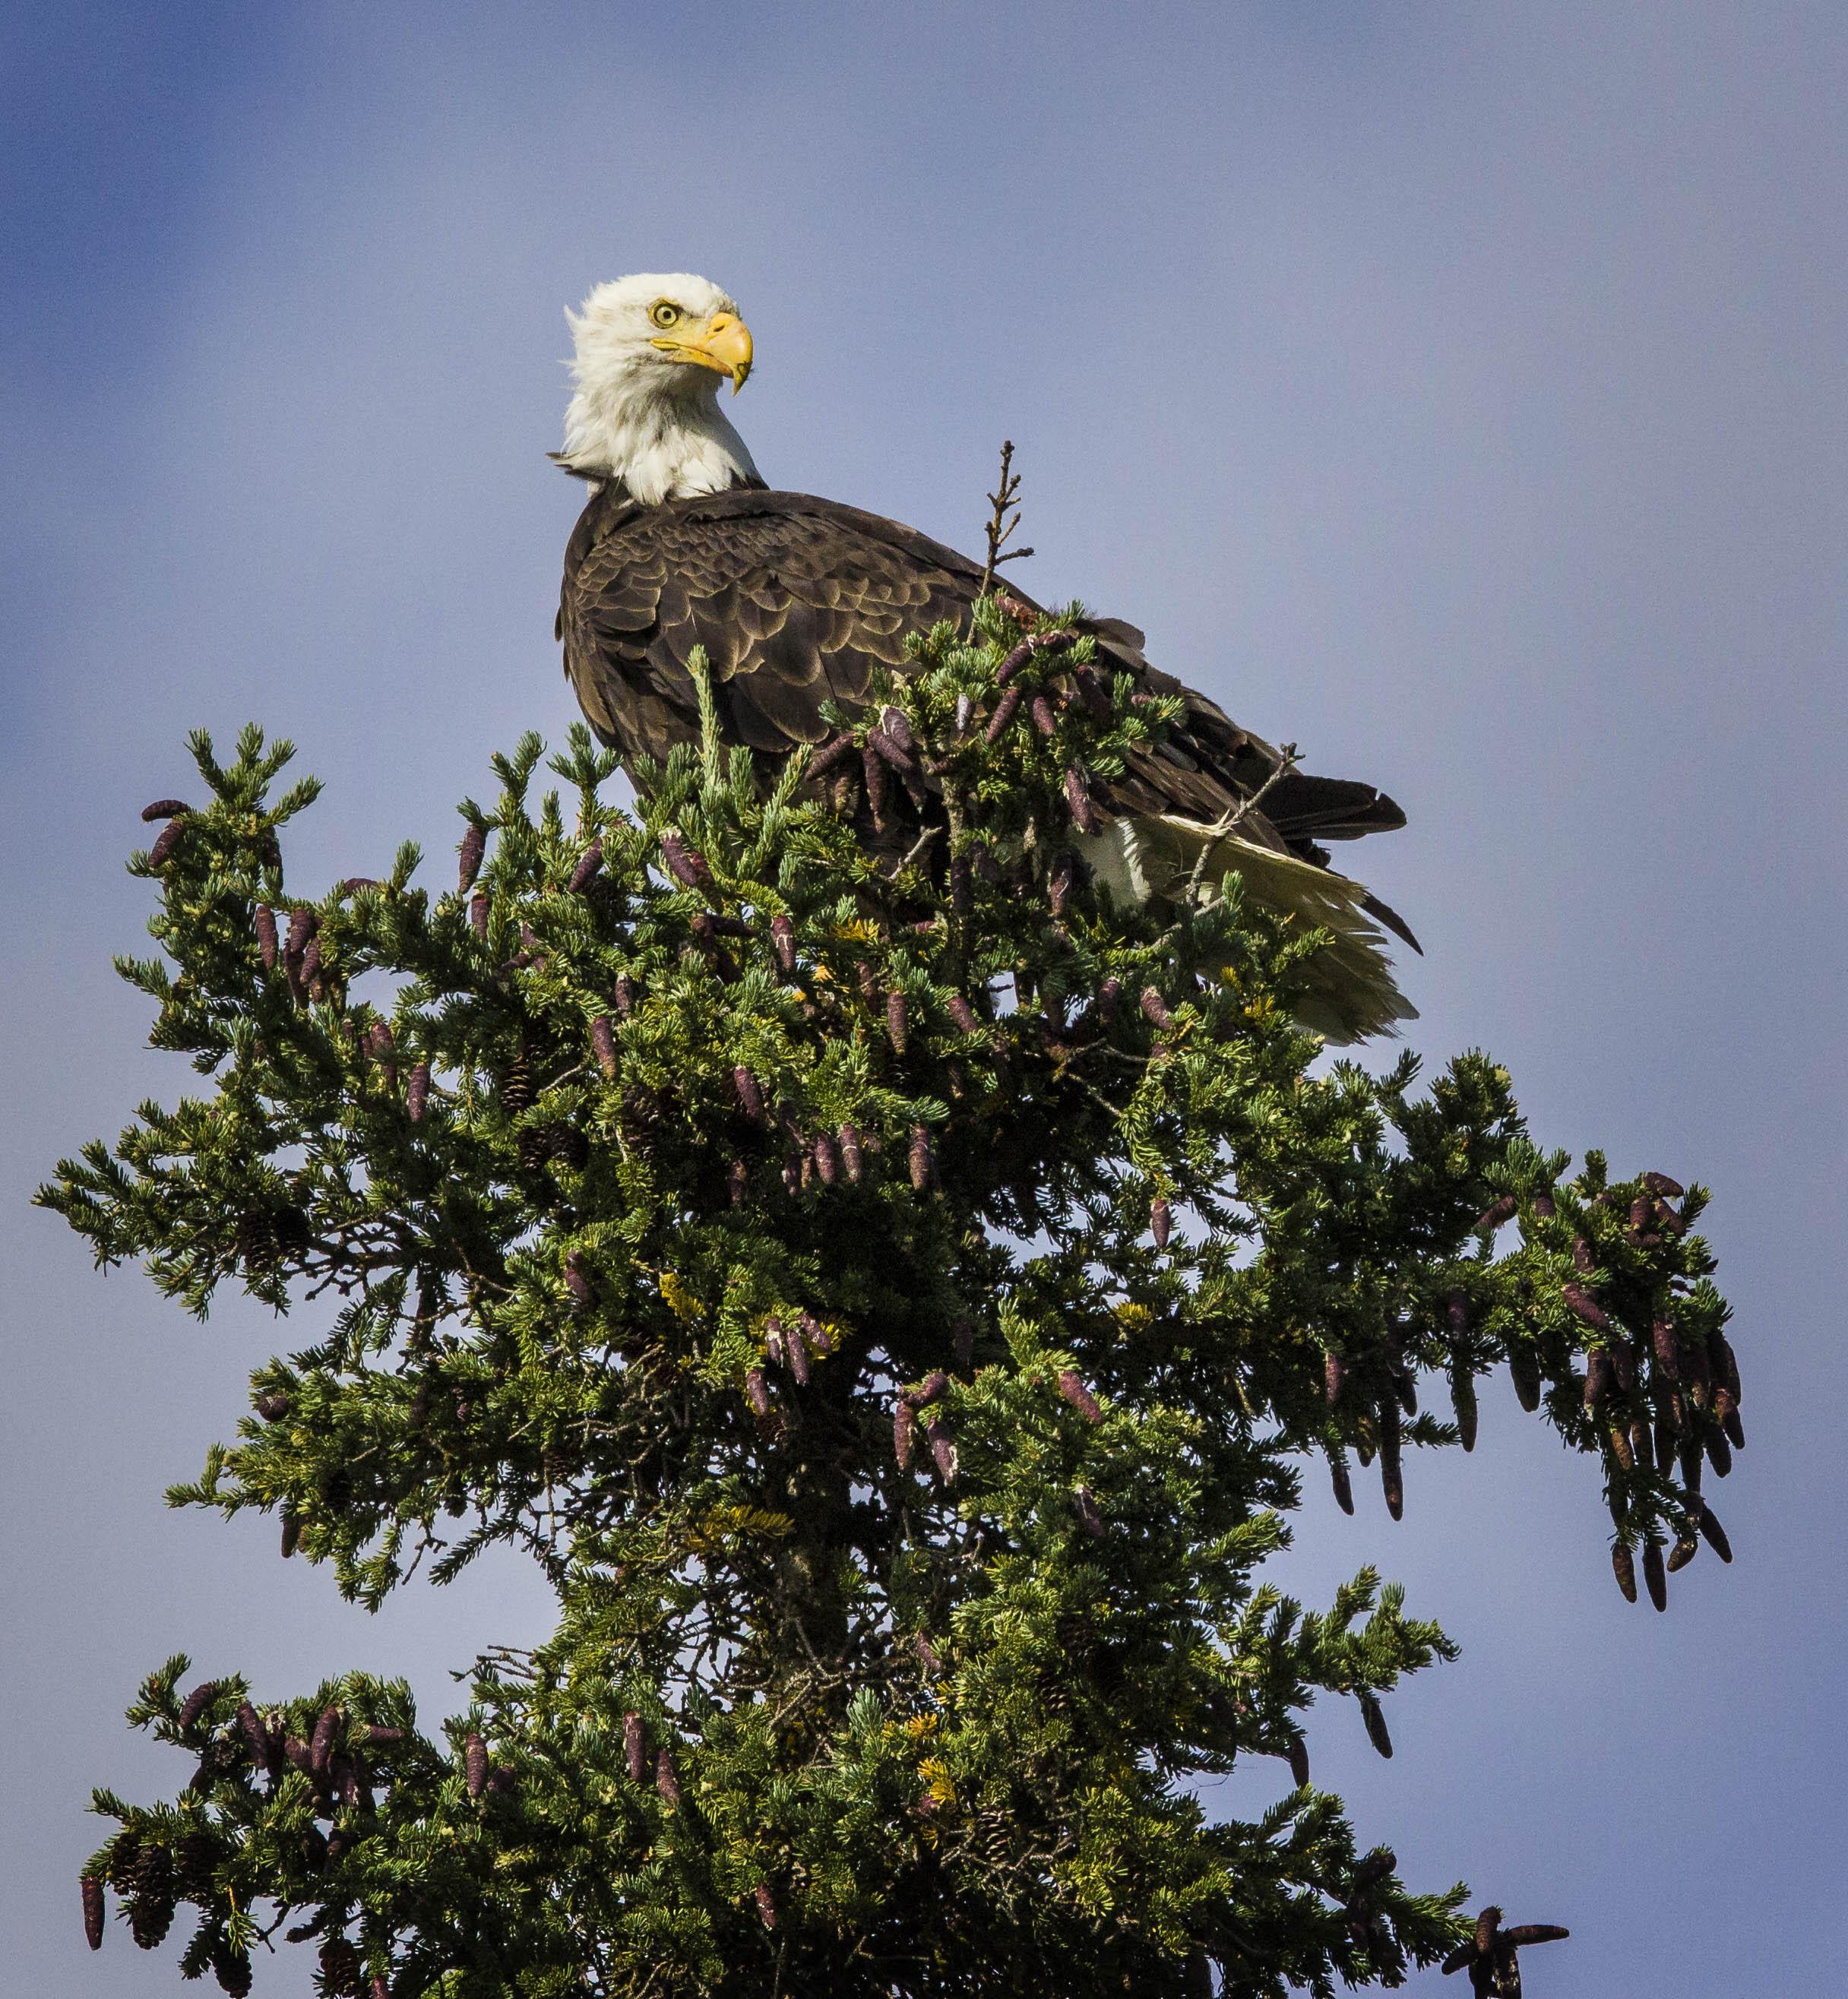 Dempster Highway, Roadtrip, Landscape, Arctic, rob gubiani, Tundra, Tombstone, Tuktoyuktuk, Inuvik, Dempster, Yukon, travel, wanderlust, bald eagle, eagle, raptor,